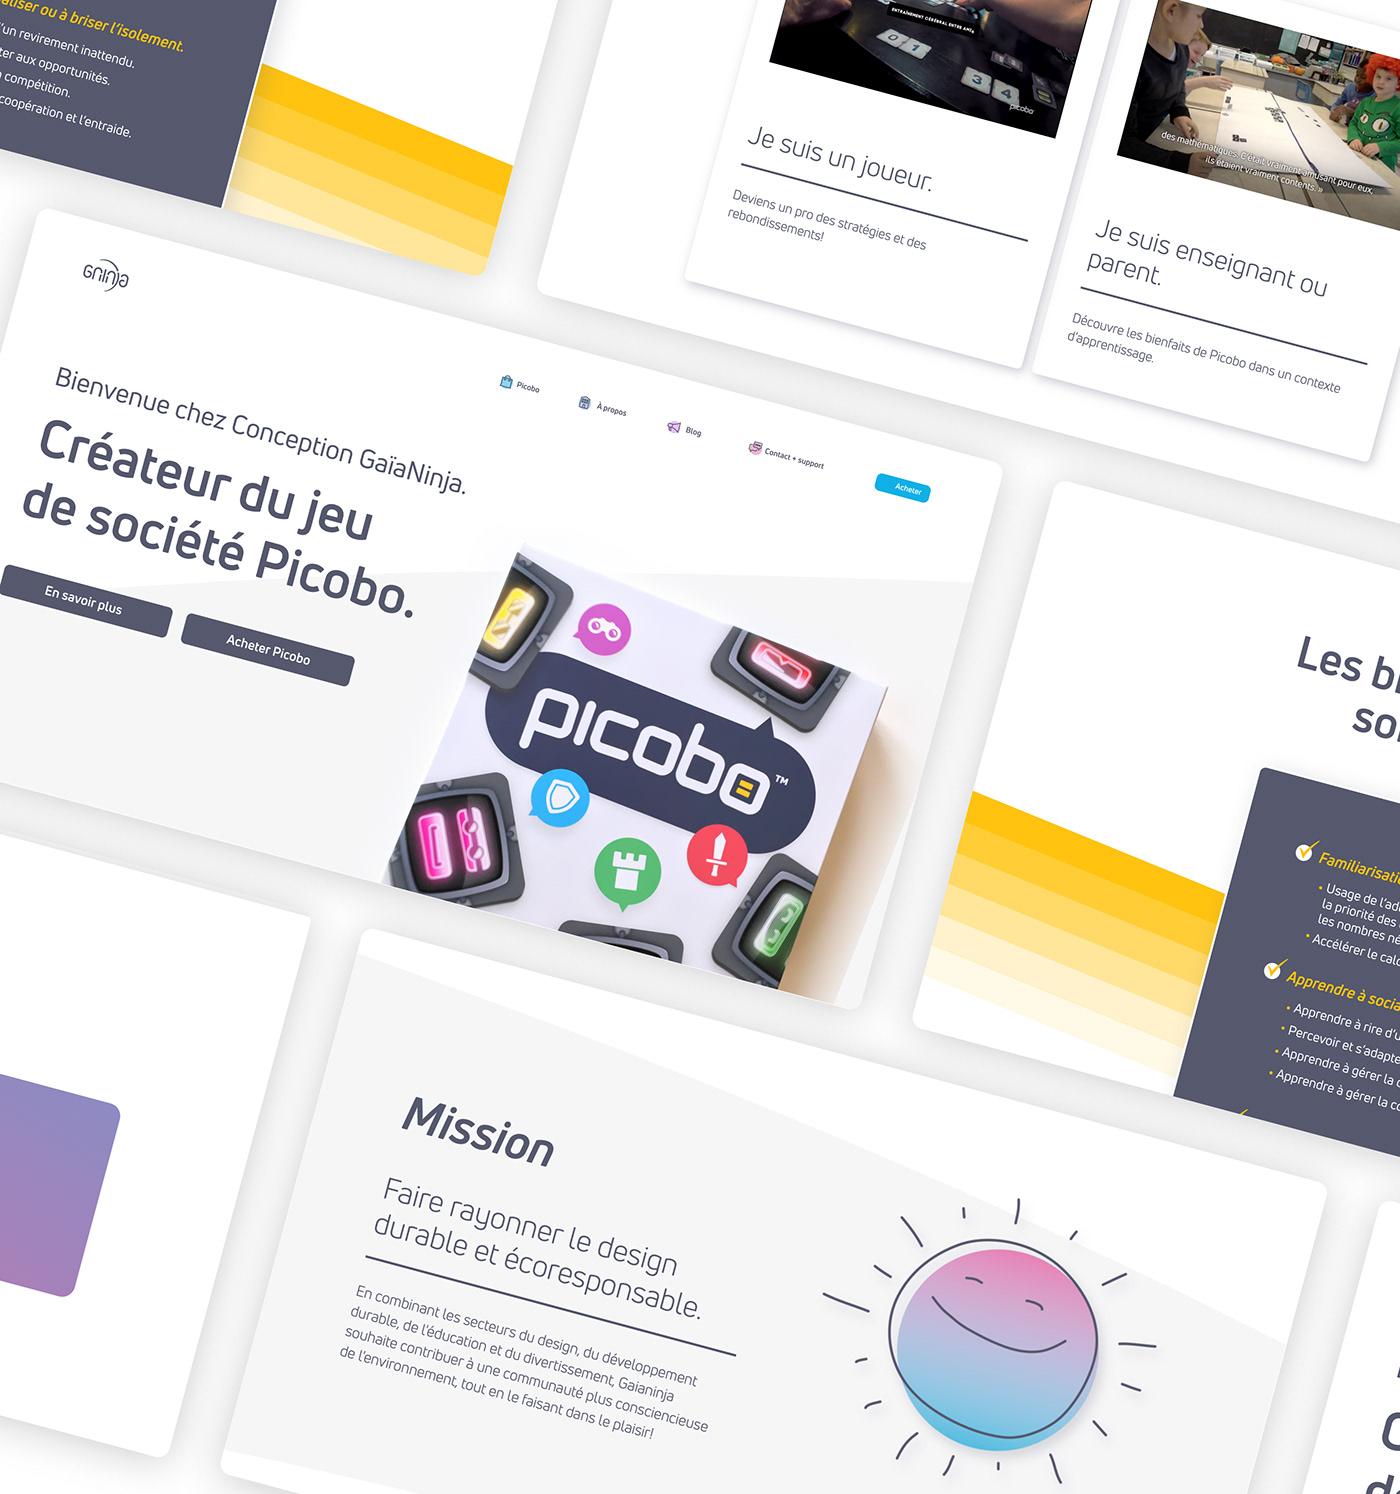 graphic design  Web Design  Conception gaianinja Interface picobo SEO UI ux Website